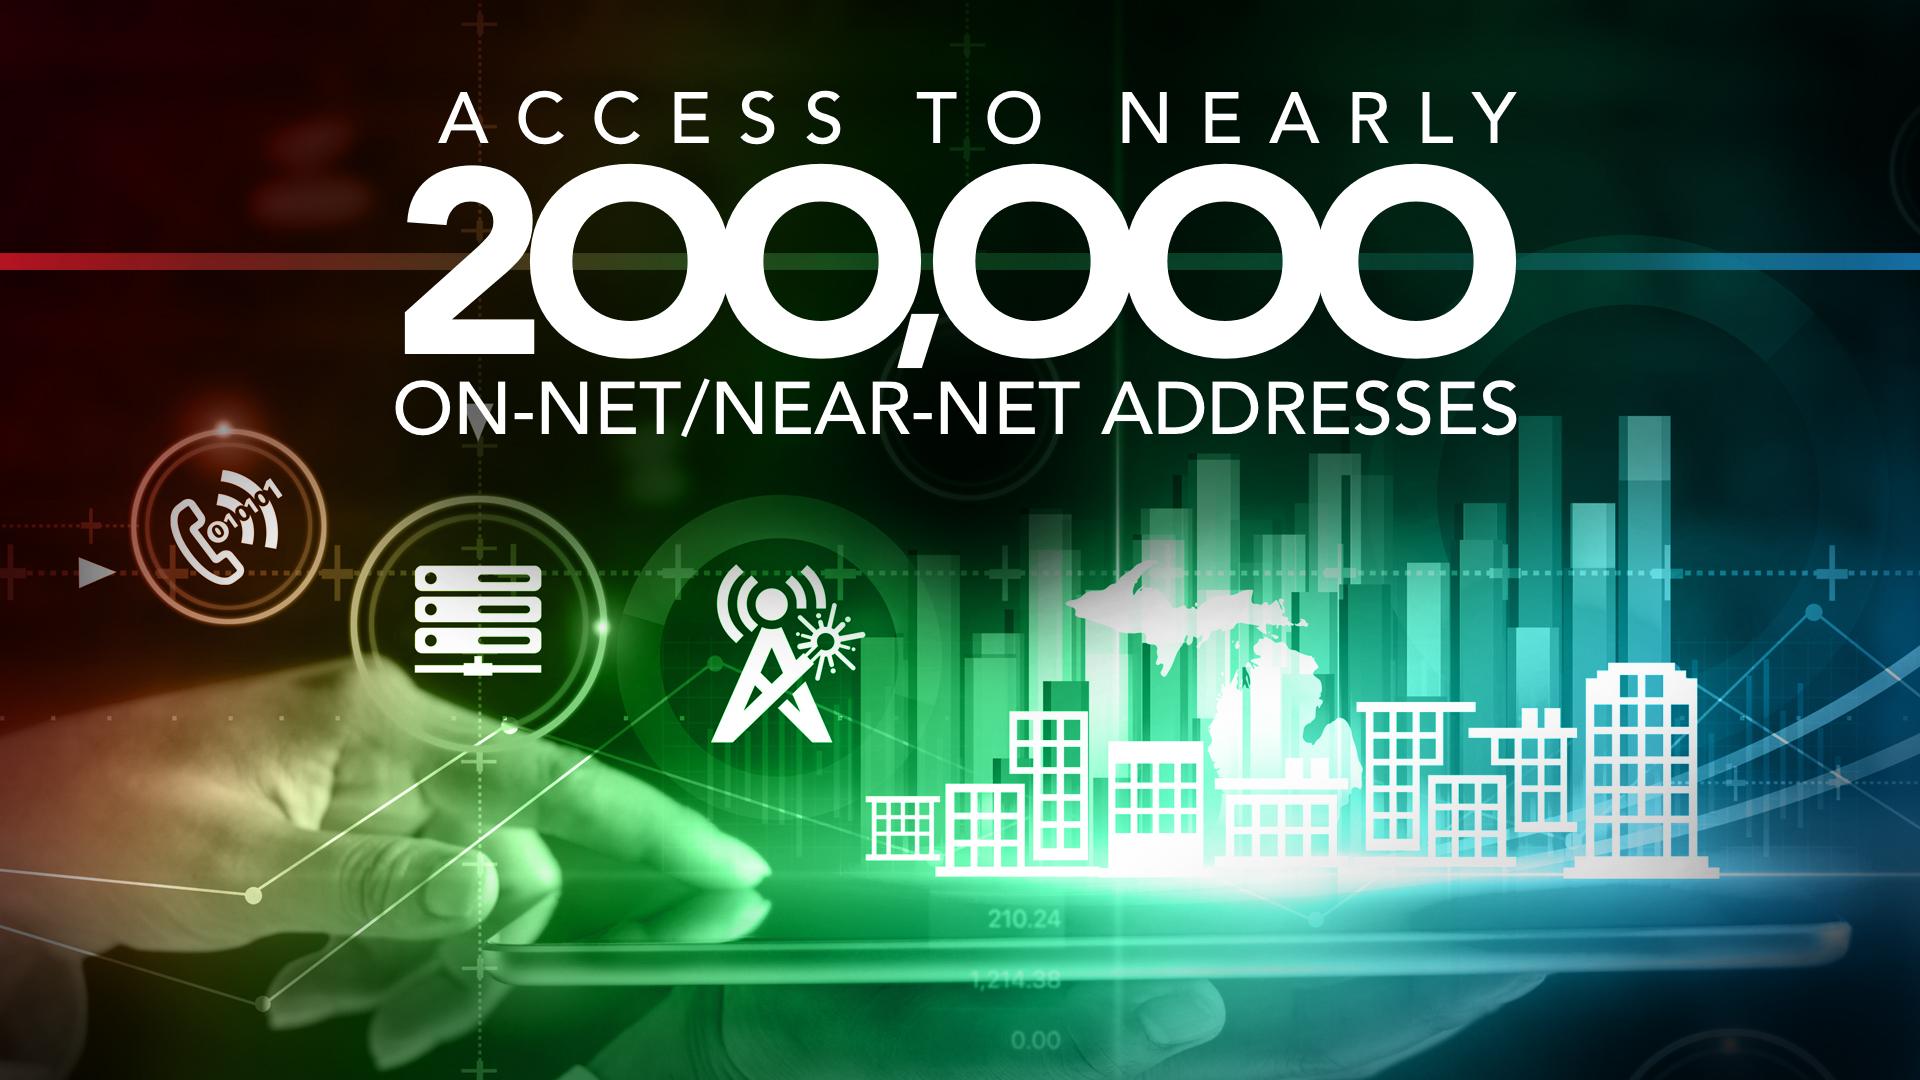 123NET On-Net/Near-Net List Grows Close to 200,000 Addresses